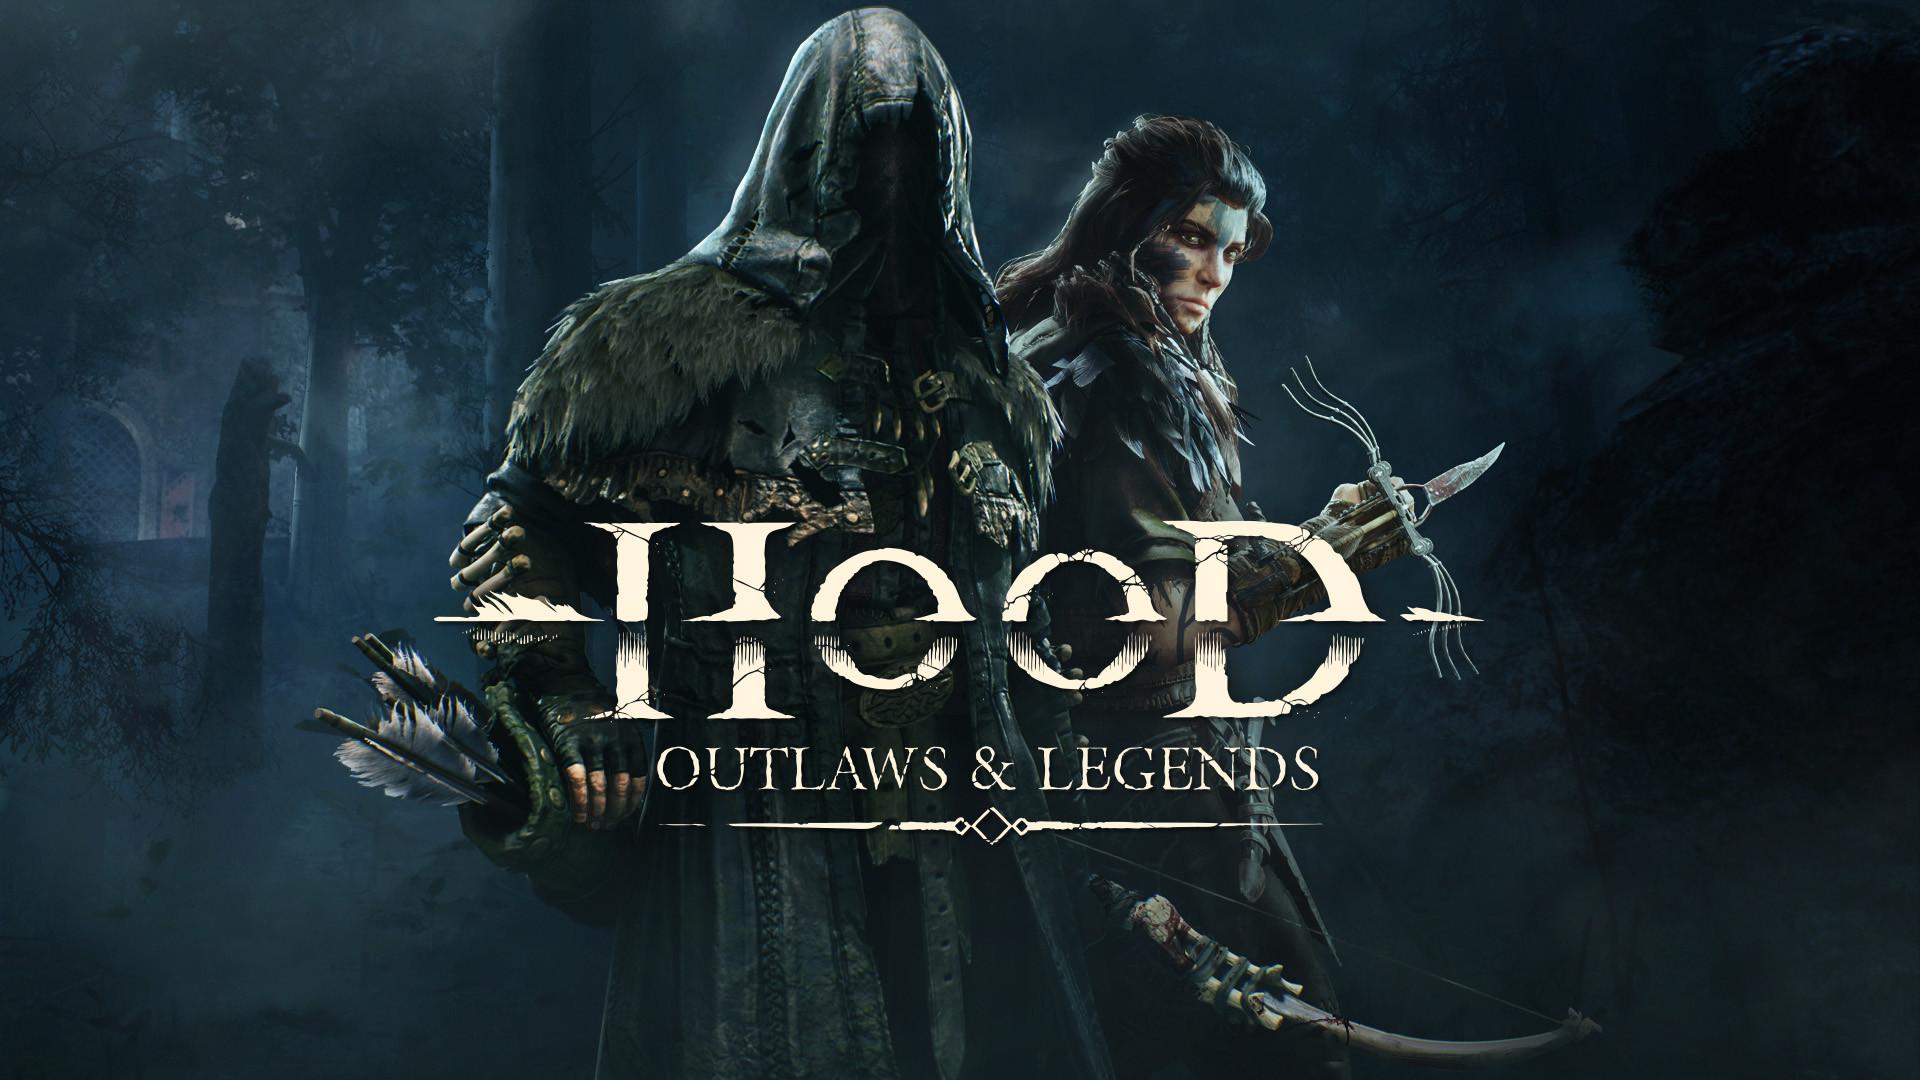 Hood Outlaws Legends 782020 1